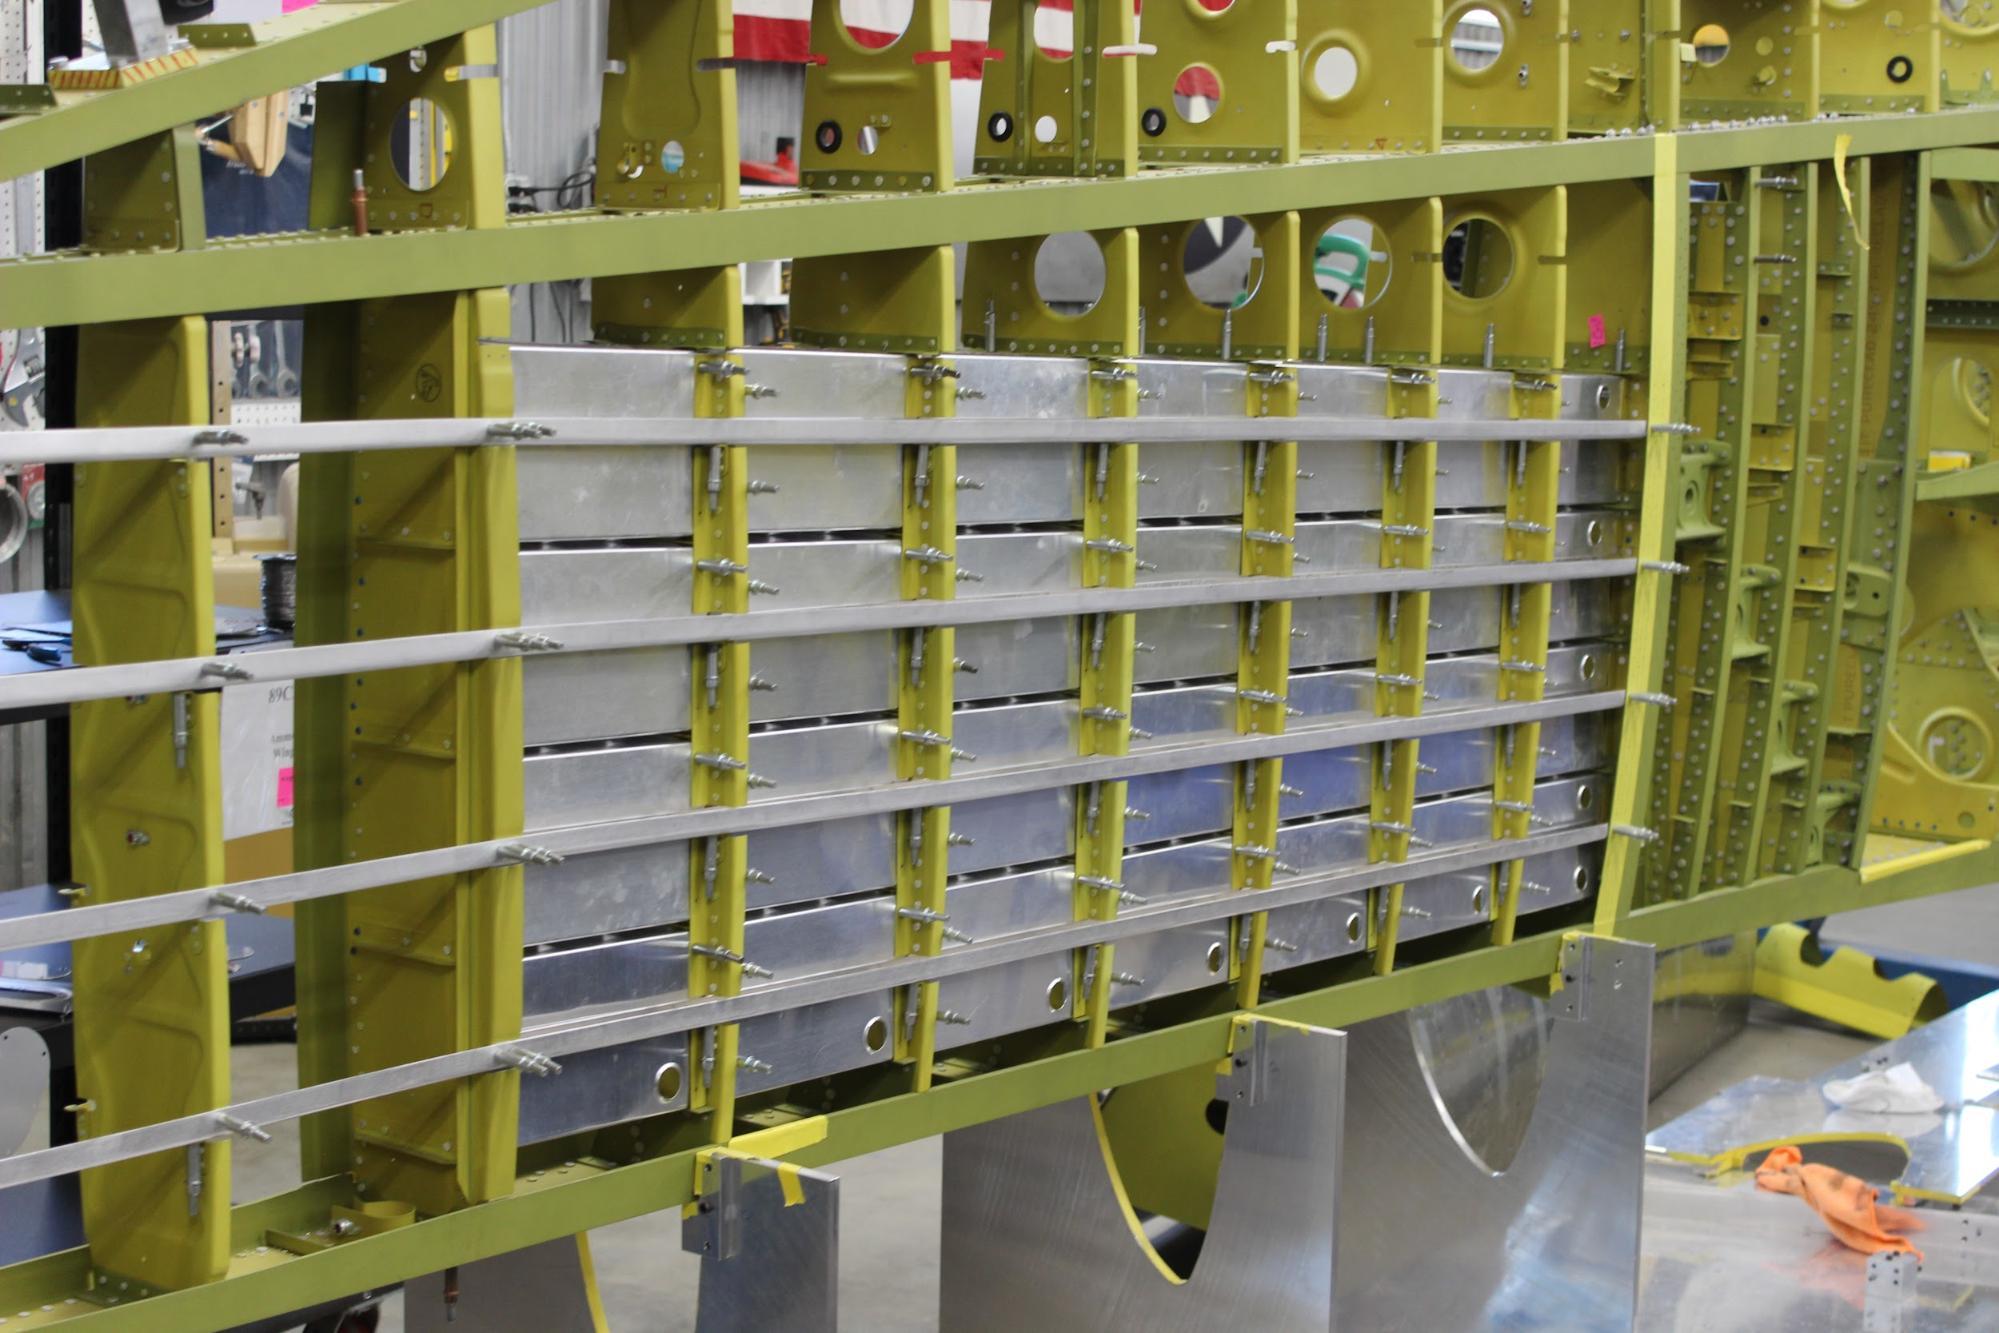 P-47: Ammo Boxes